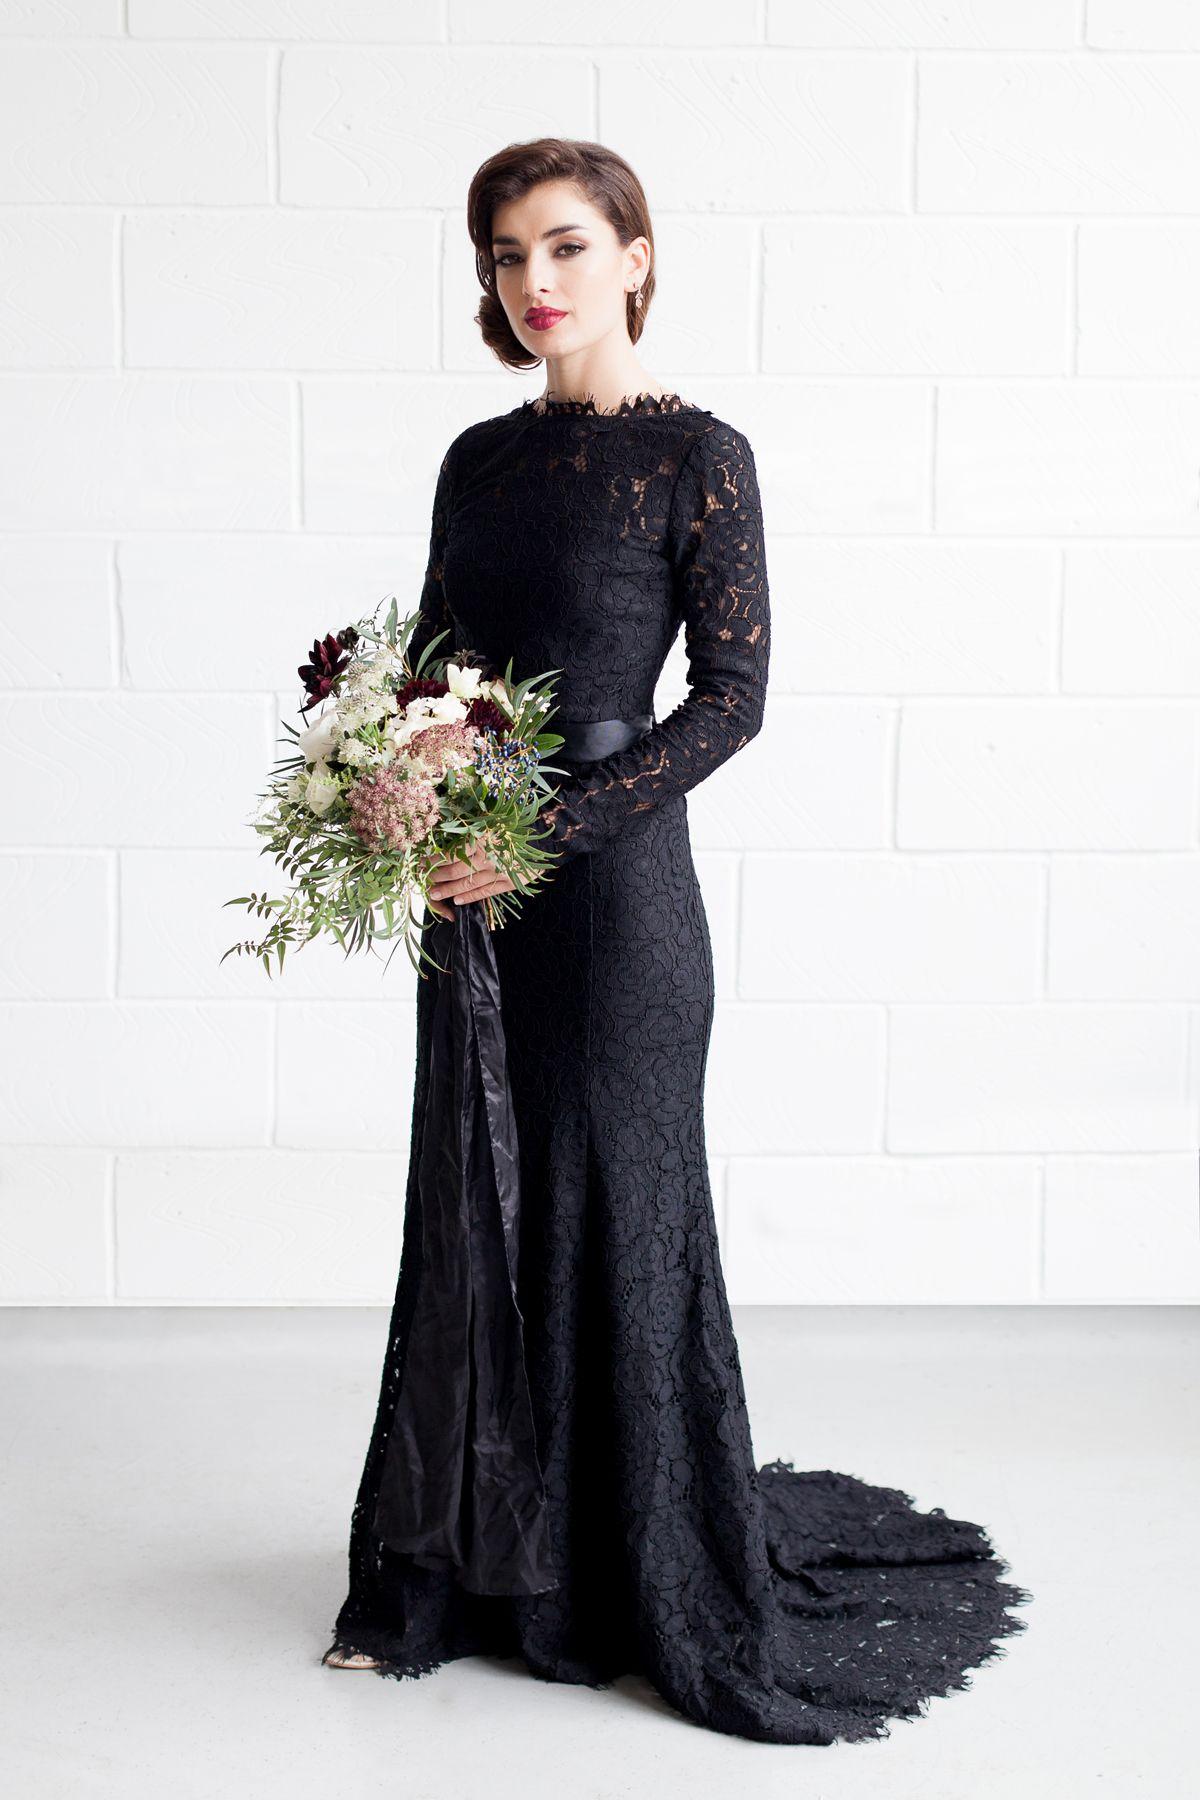 Elegant Industrial Styled Wedding The Overwhelmed Bride Wedding Blog Socal Wedding Planner Black Lace Wedding Dress Black Lace Wedding Black Wedding Gowns [ 1800 x 1200 Pixel ]